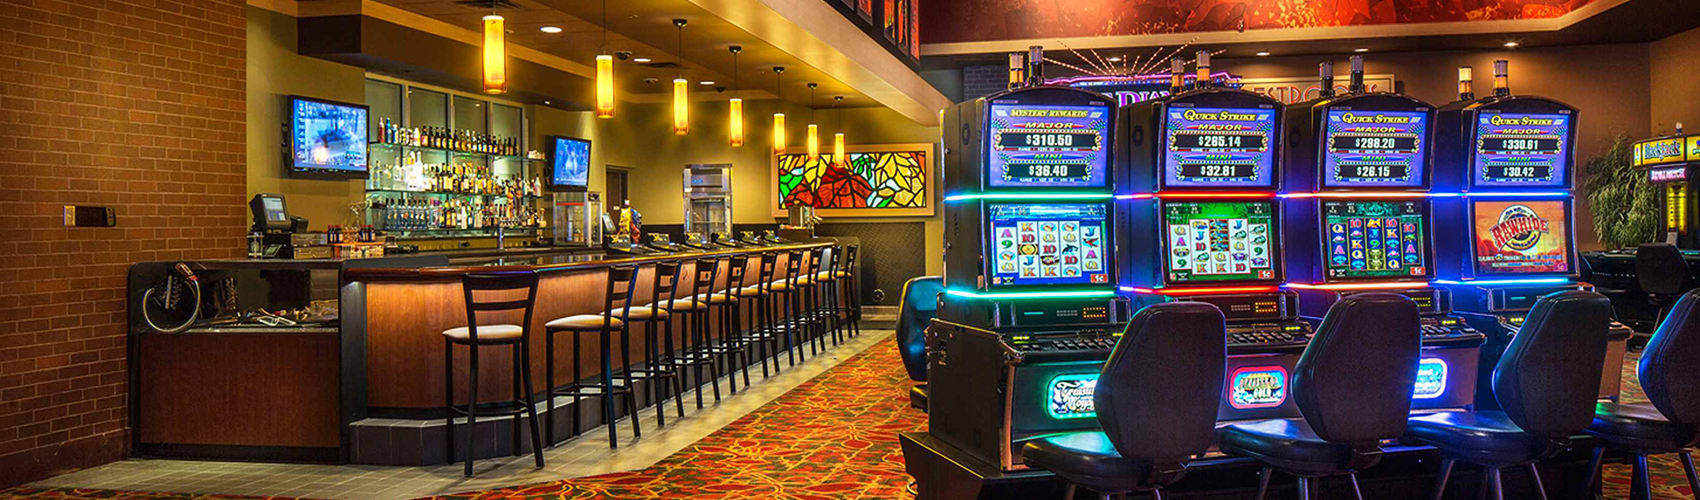 Slot Machines Michigan Casino With Slots Leelanau Sands